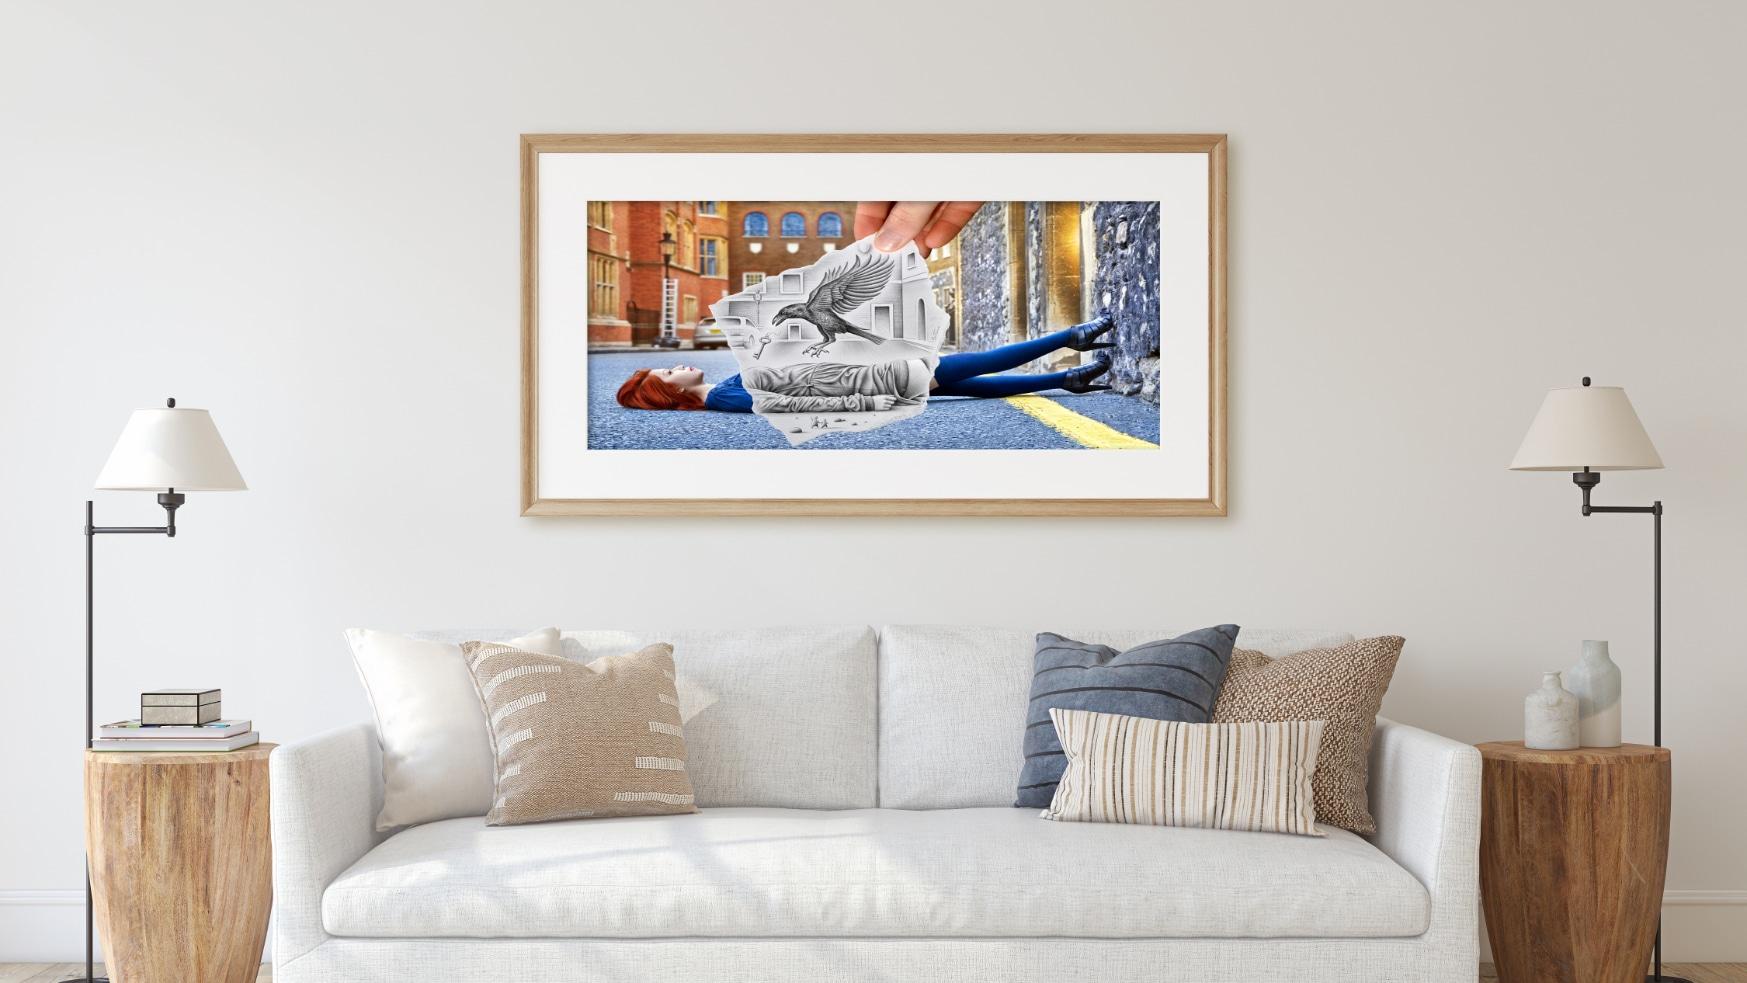 unique artwork sketches